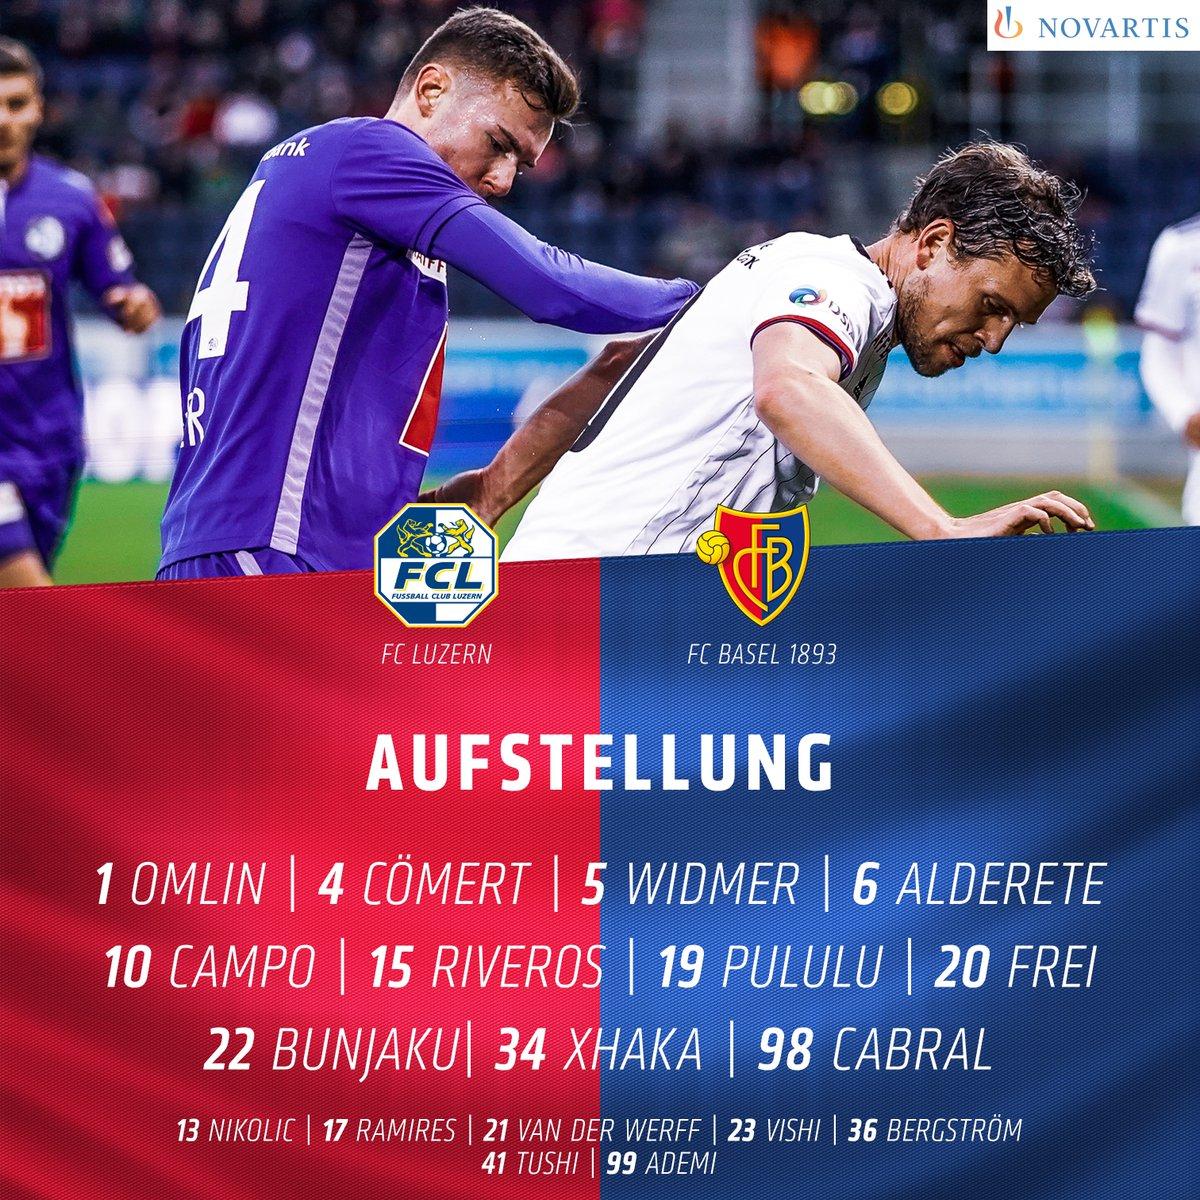 So starten wir in den Liga-#restart 💪🏼 #FCBasel1893 #zämmestark #rotblaulive https://t.co/ZHckijUzNj